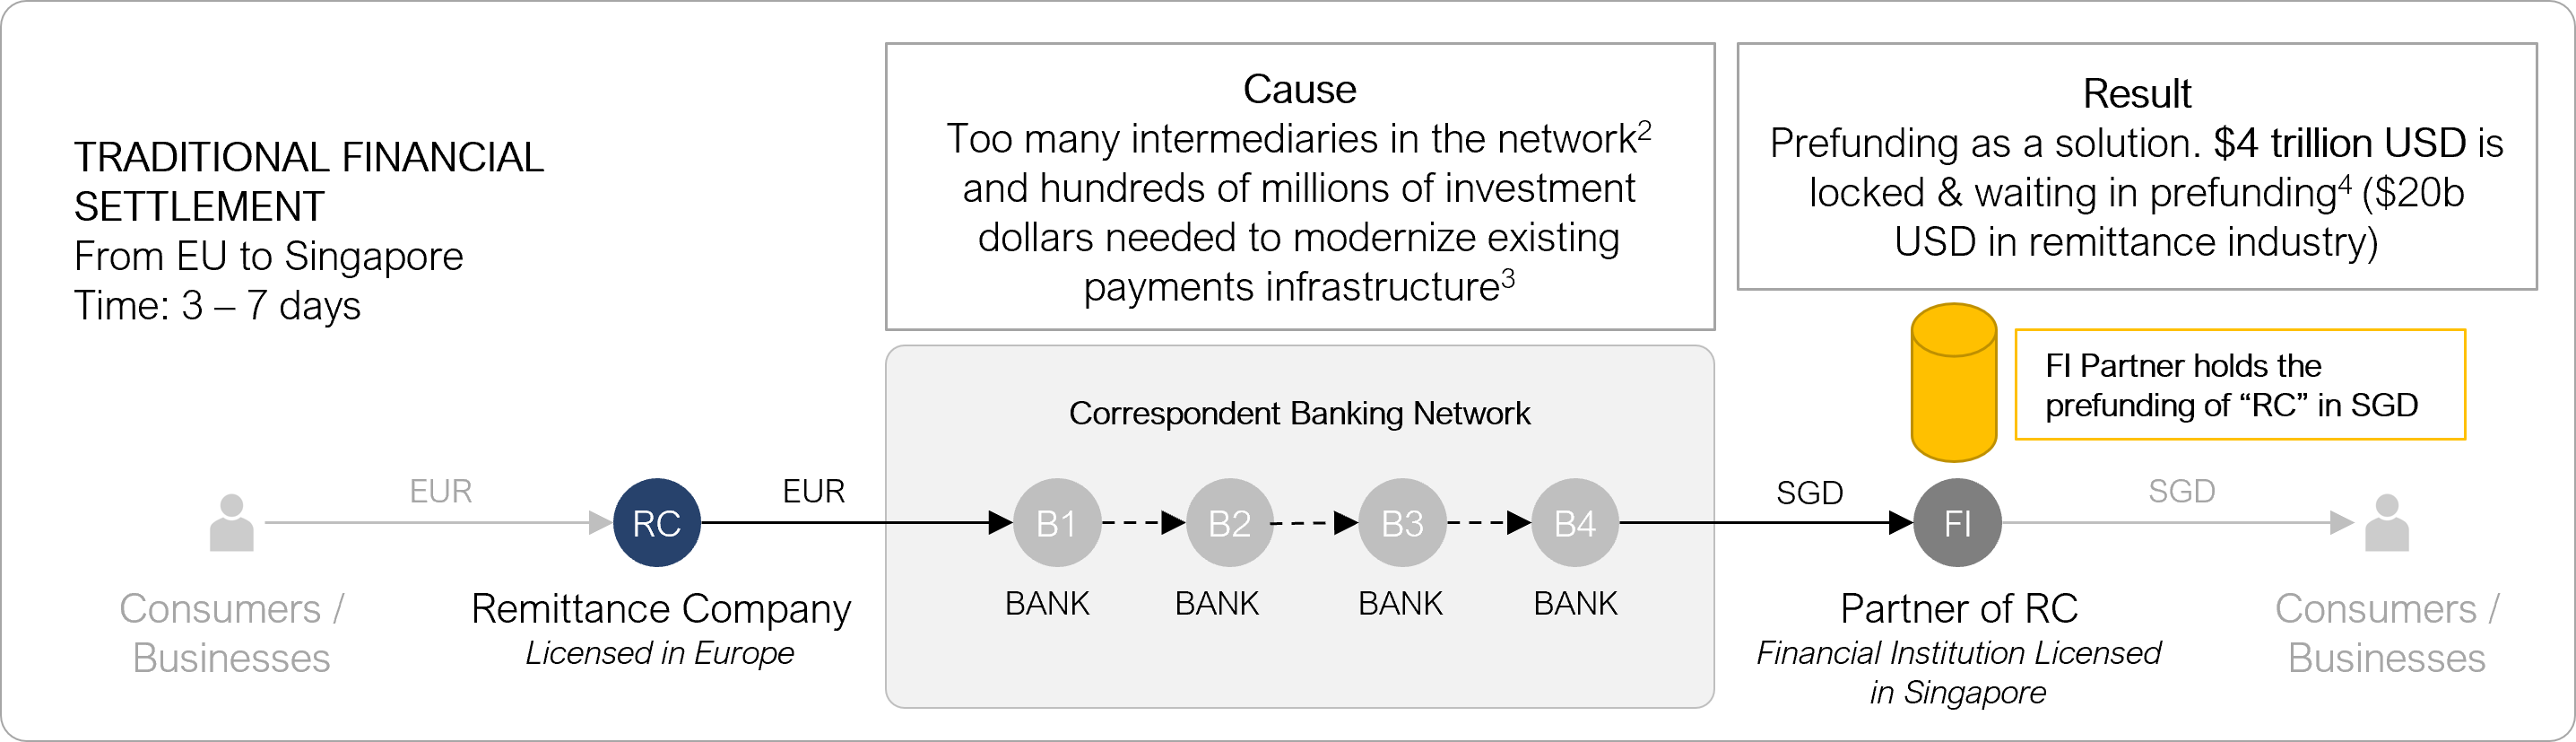 Prefunding, Correspondent Banking